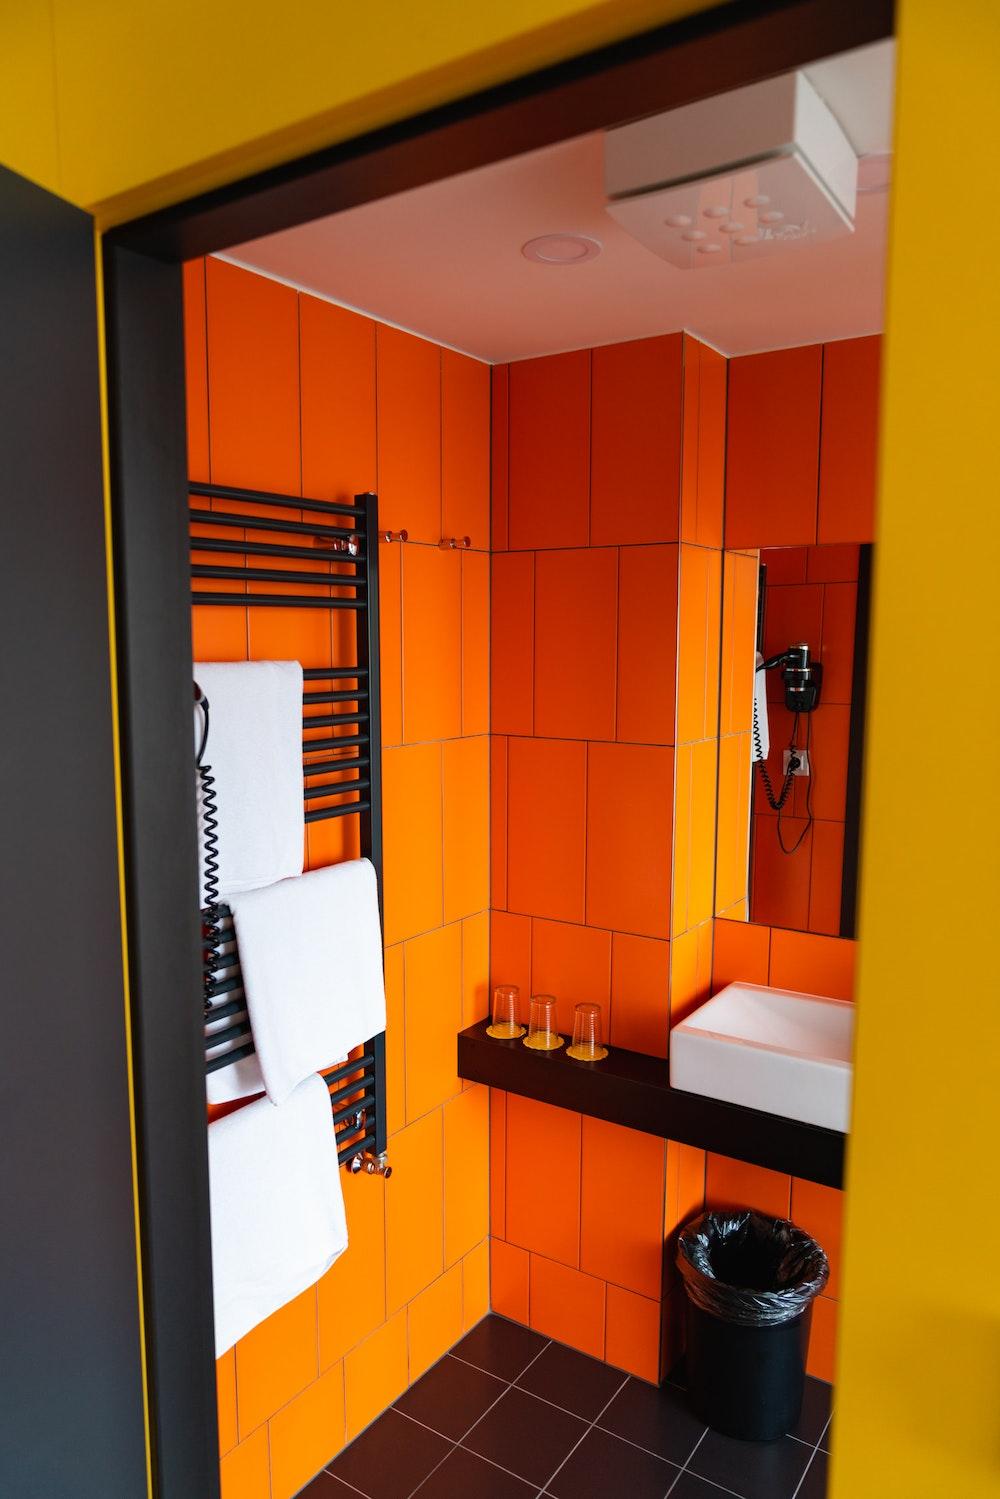 Orange-tiled bathroom at a MeetMe23 hotel room in Prague